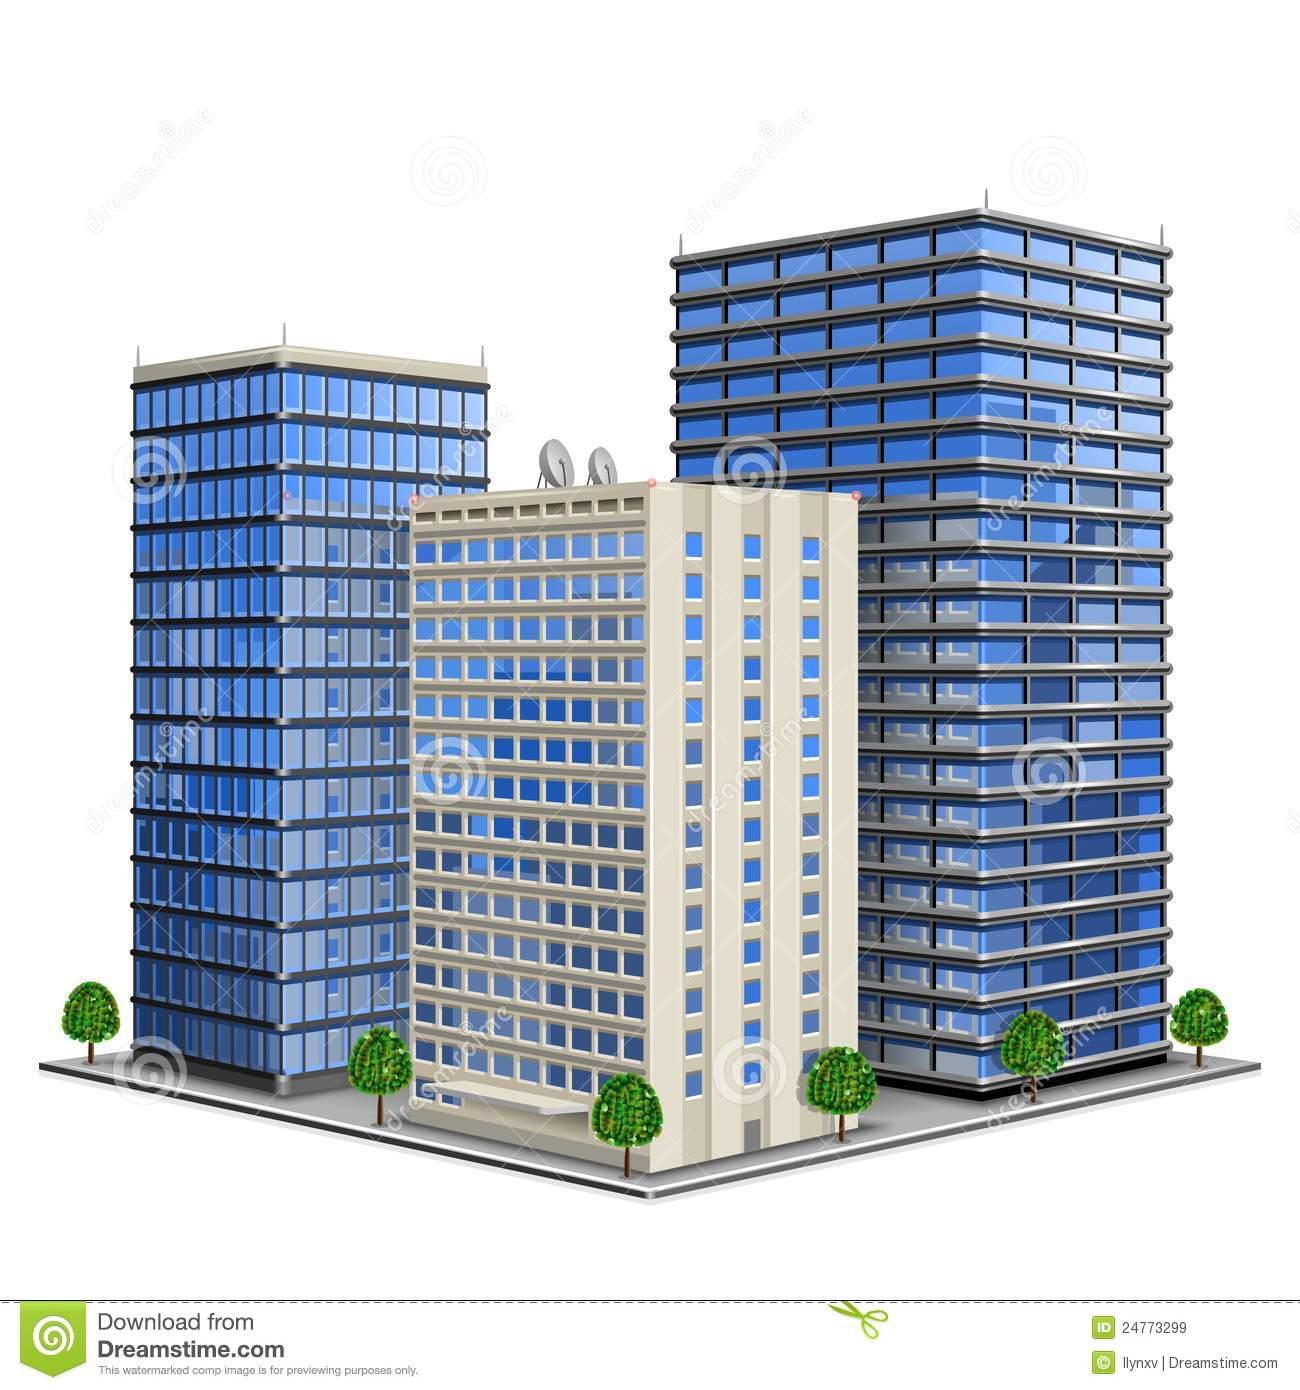 78+ Building Clipart... Office Building Clipart | ClipartLook